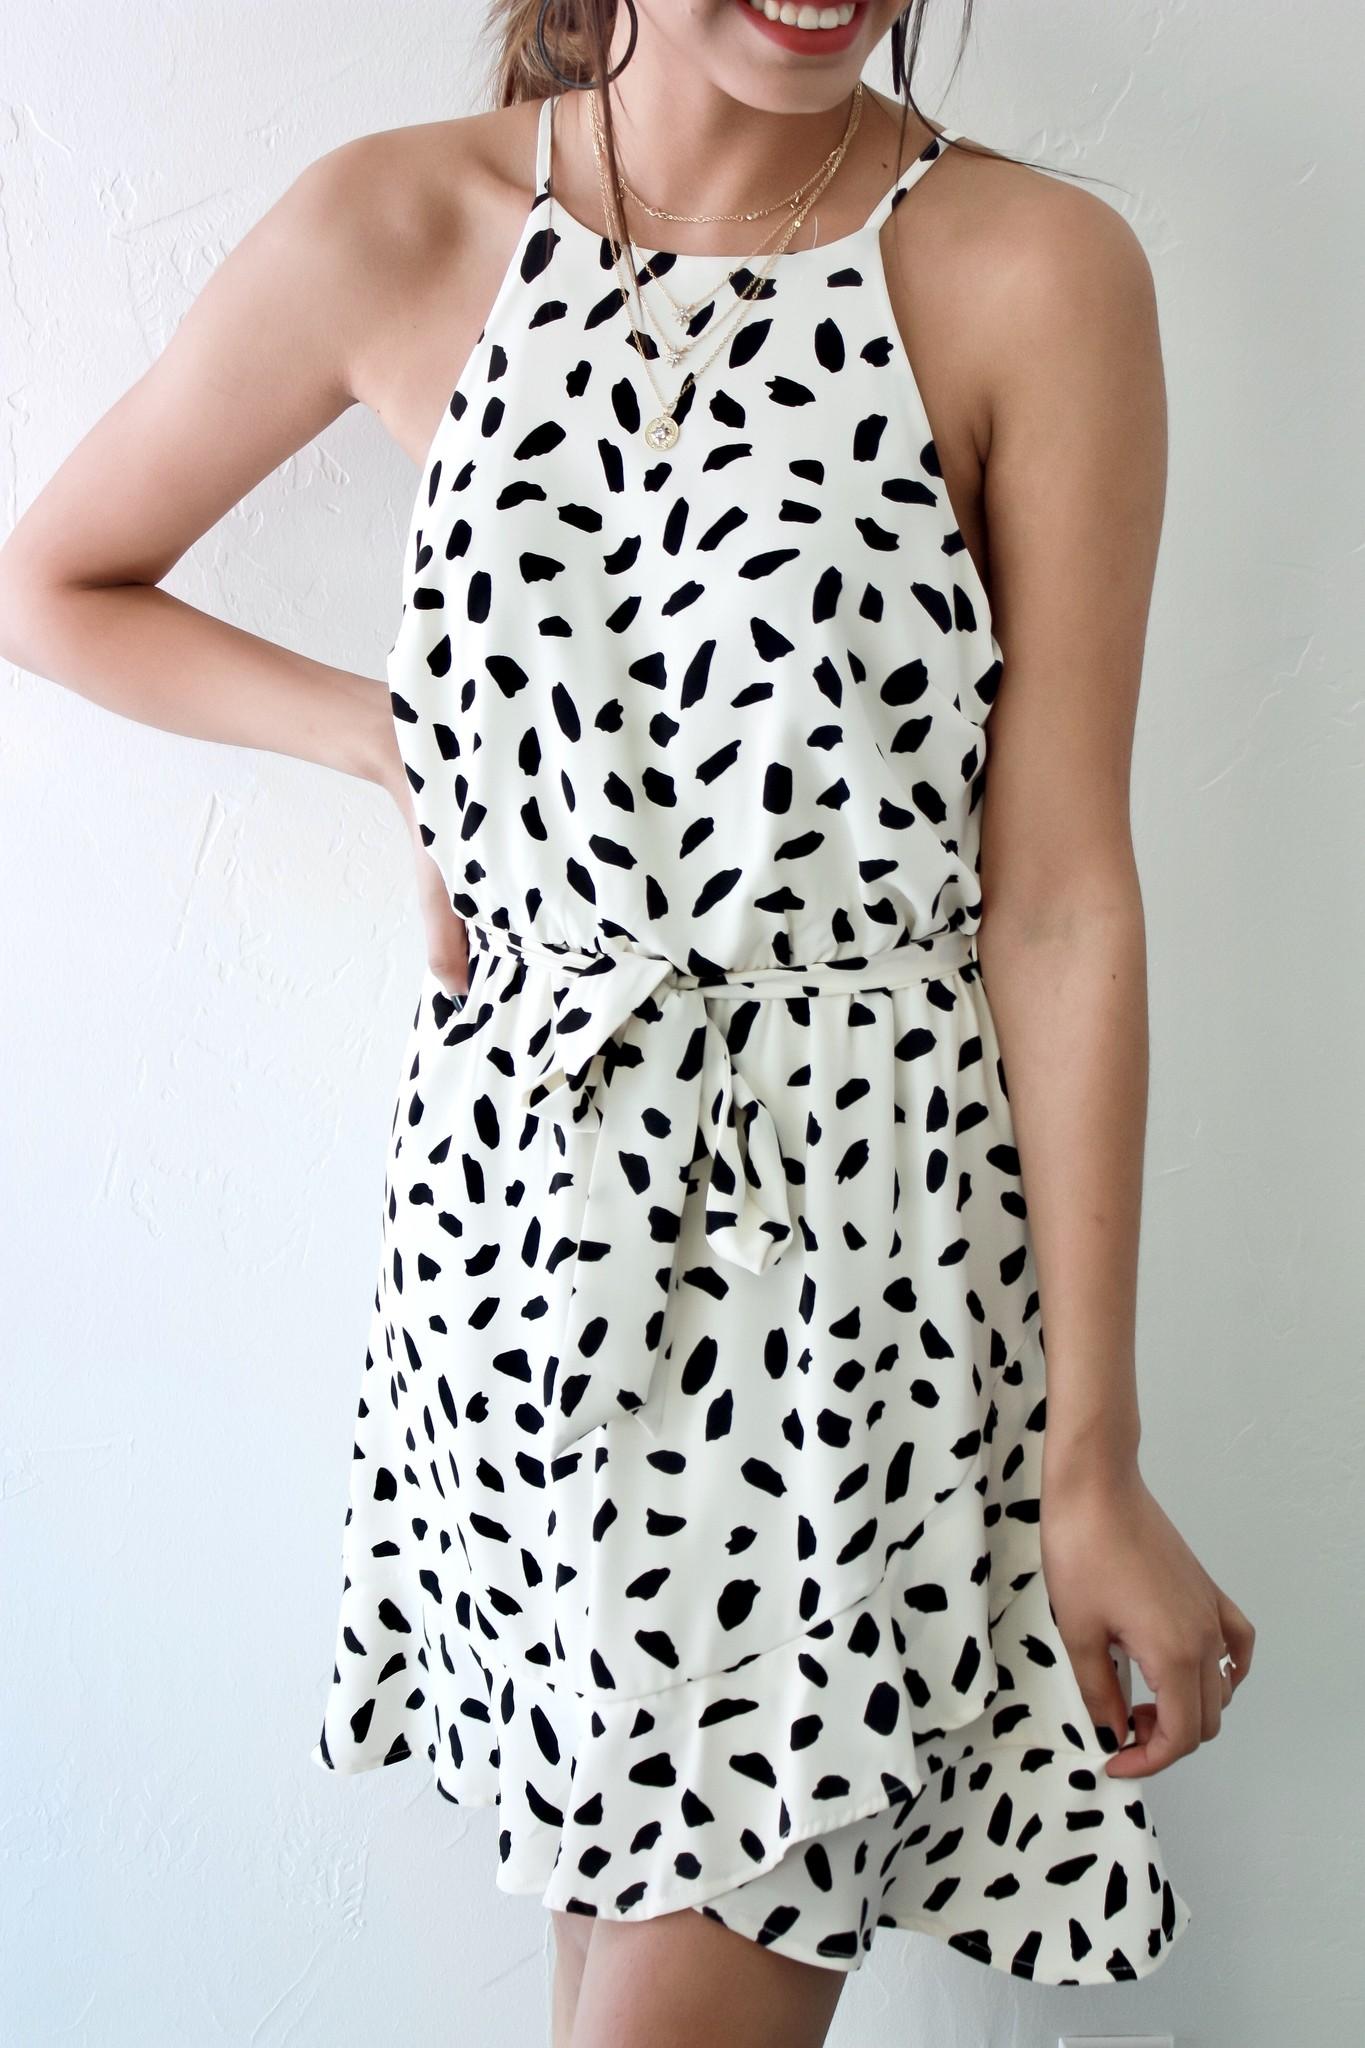 Cream Sleeveless Polka Dot Bubble Dress